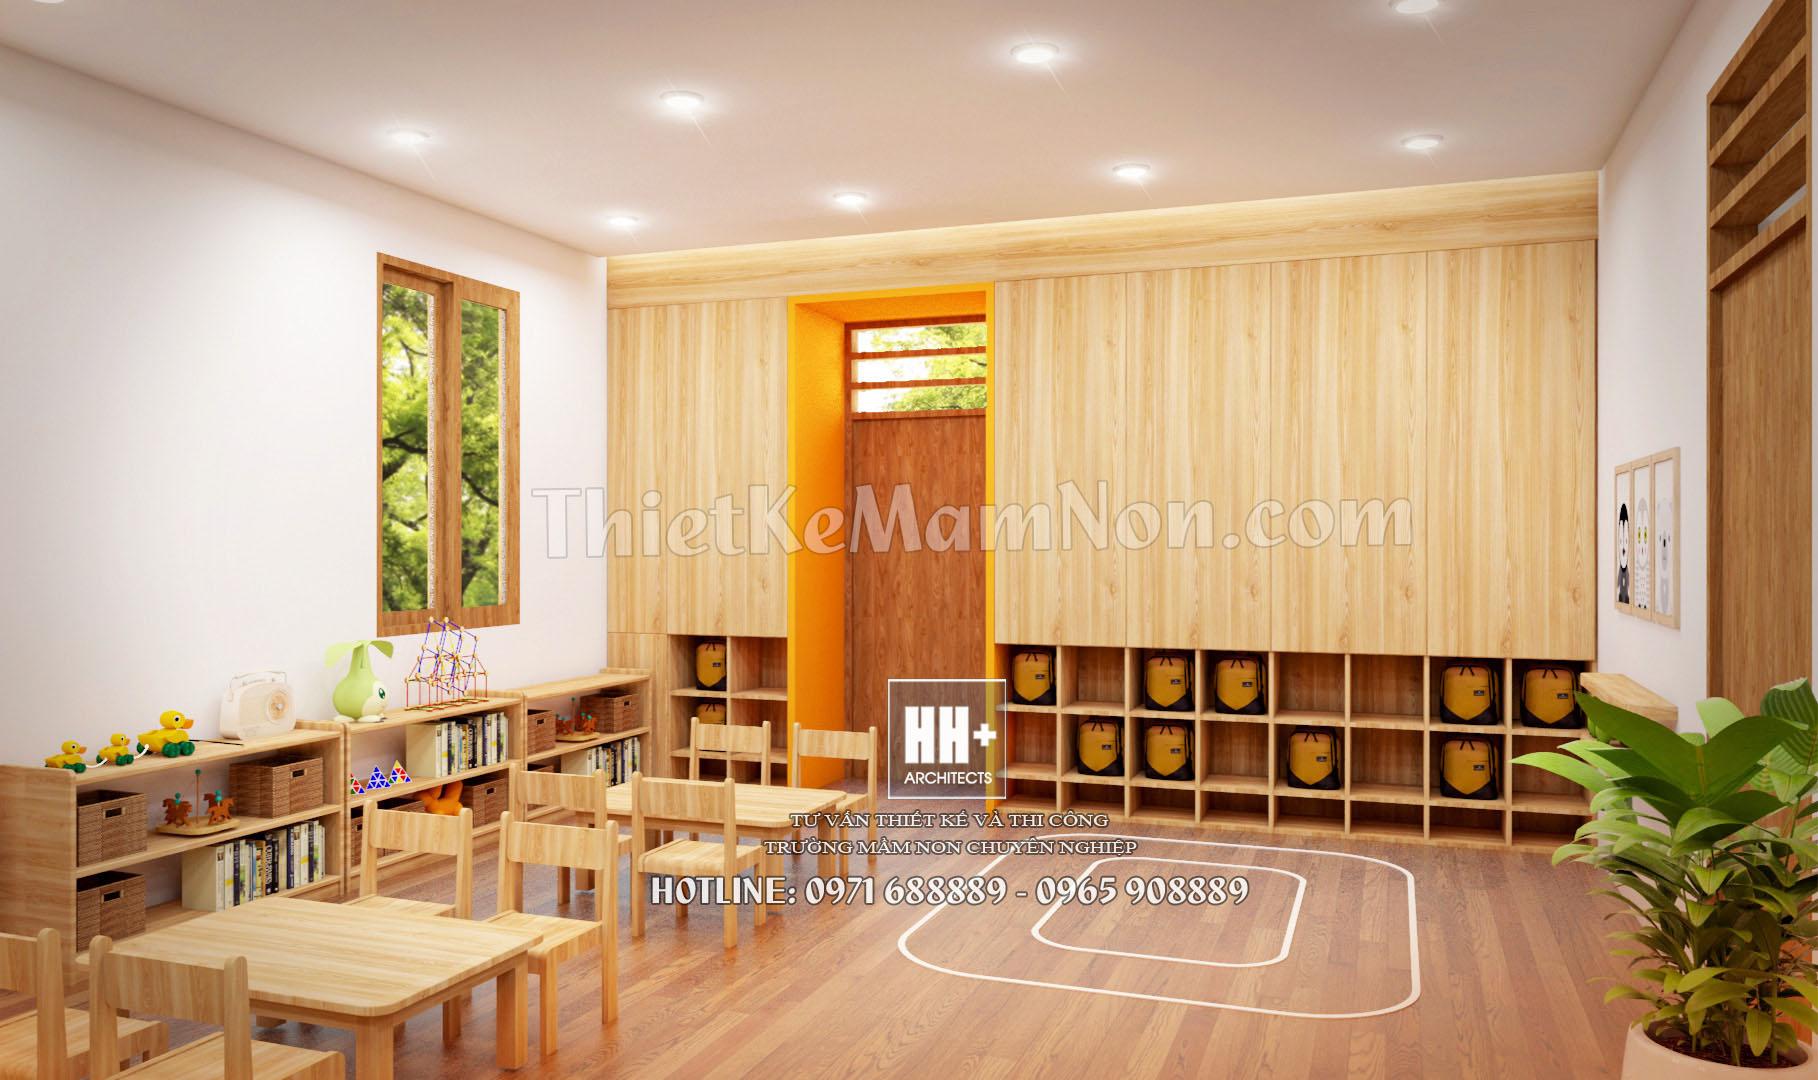 7 thiết kế trường mầm non montessori Thiết kế trường mầm non montessori Việt Anh 7 1